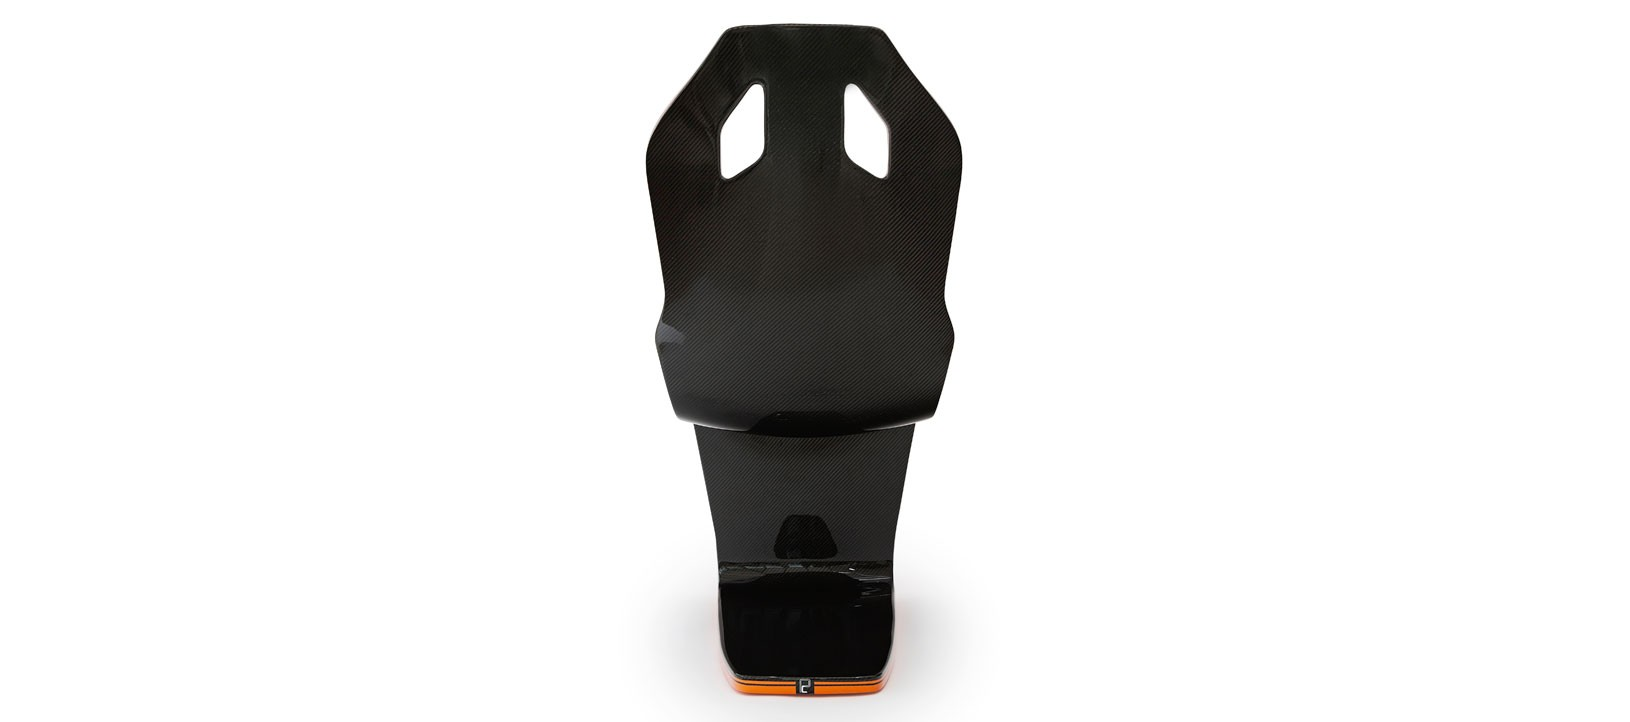 f1-carbon-fiber-lounge-chair-orange-3